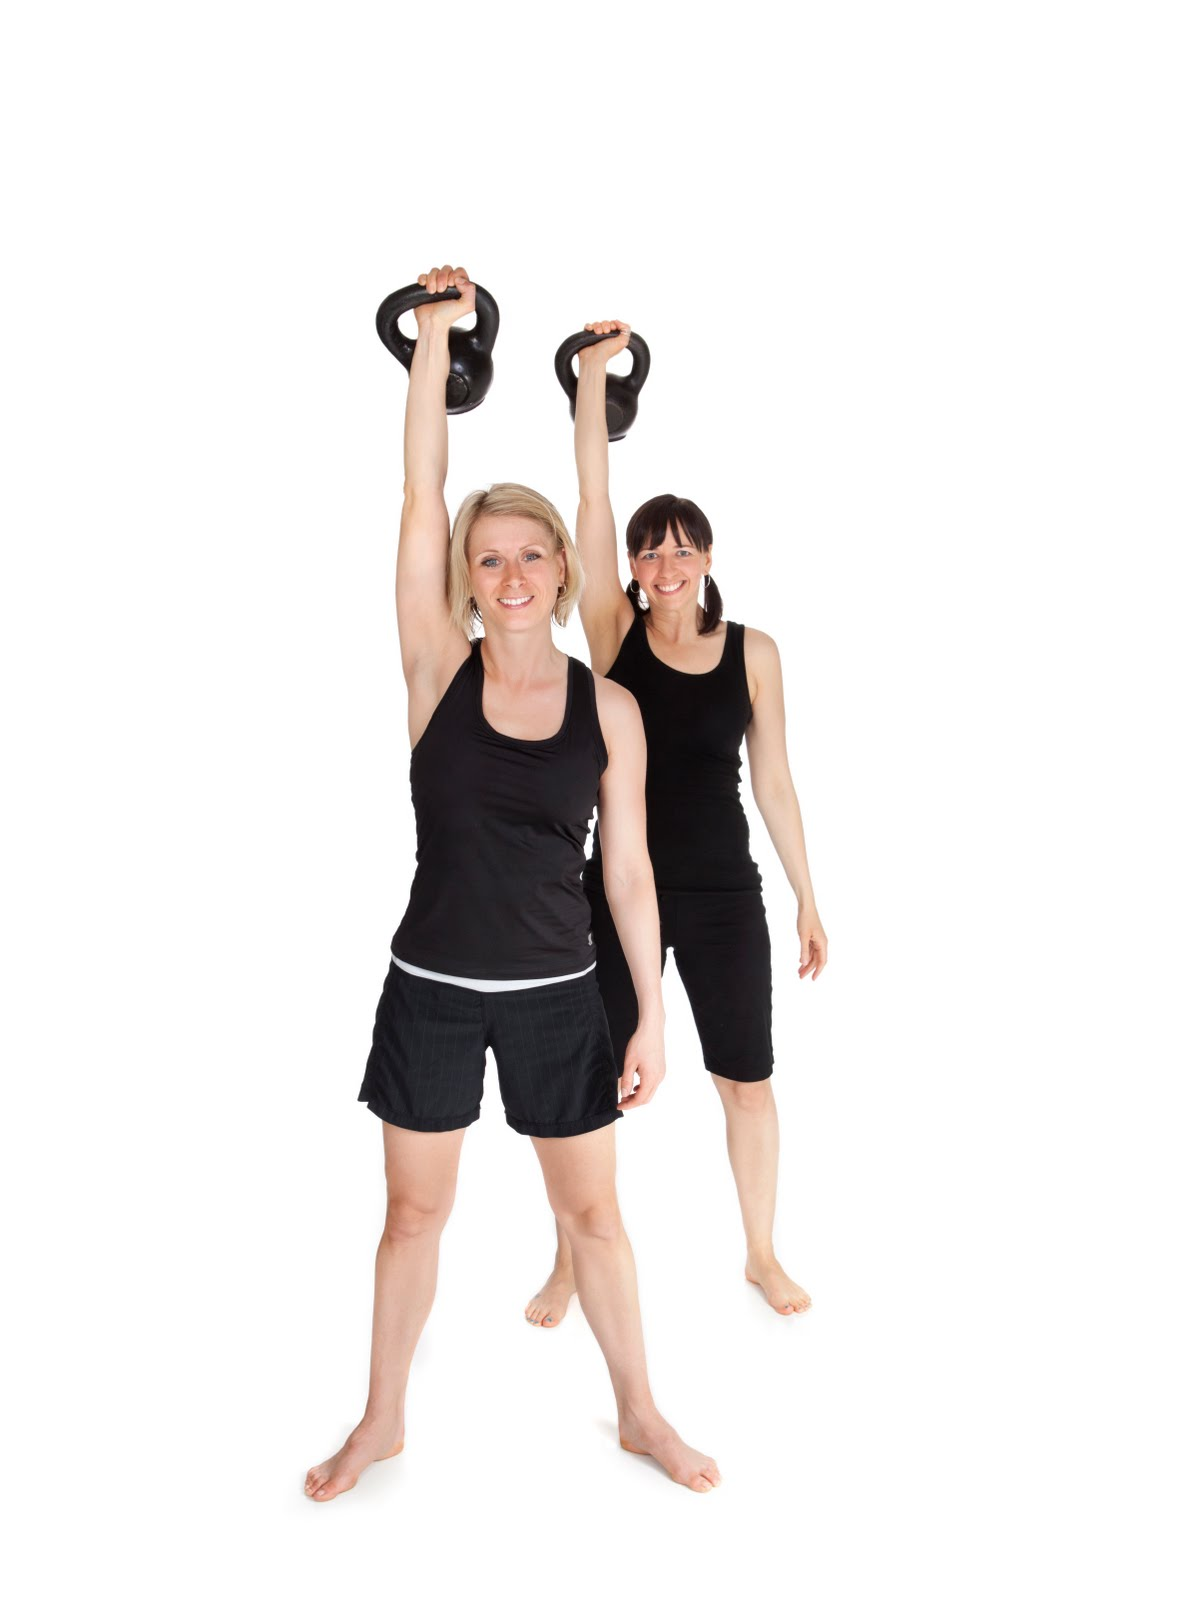 kettlebell fitness athletics kettlebell das perfekte trainingsger t f r frauen. Black Bedroom Furniture Sets. Home Design Ideas